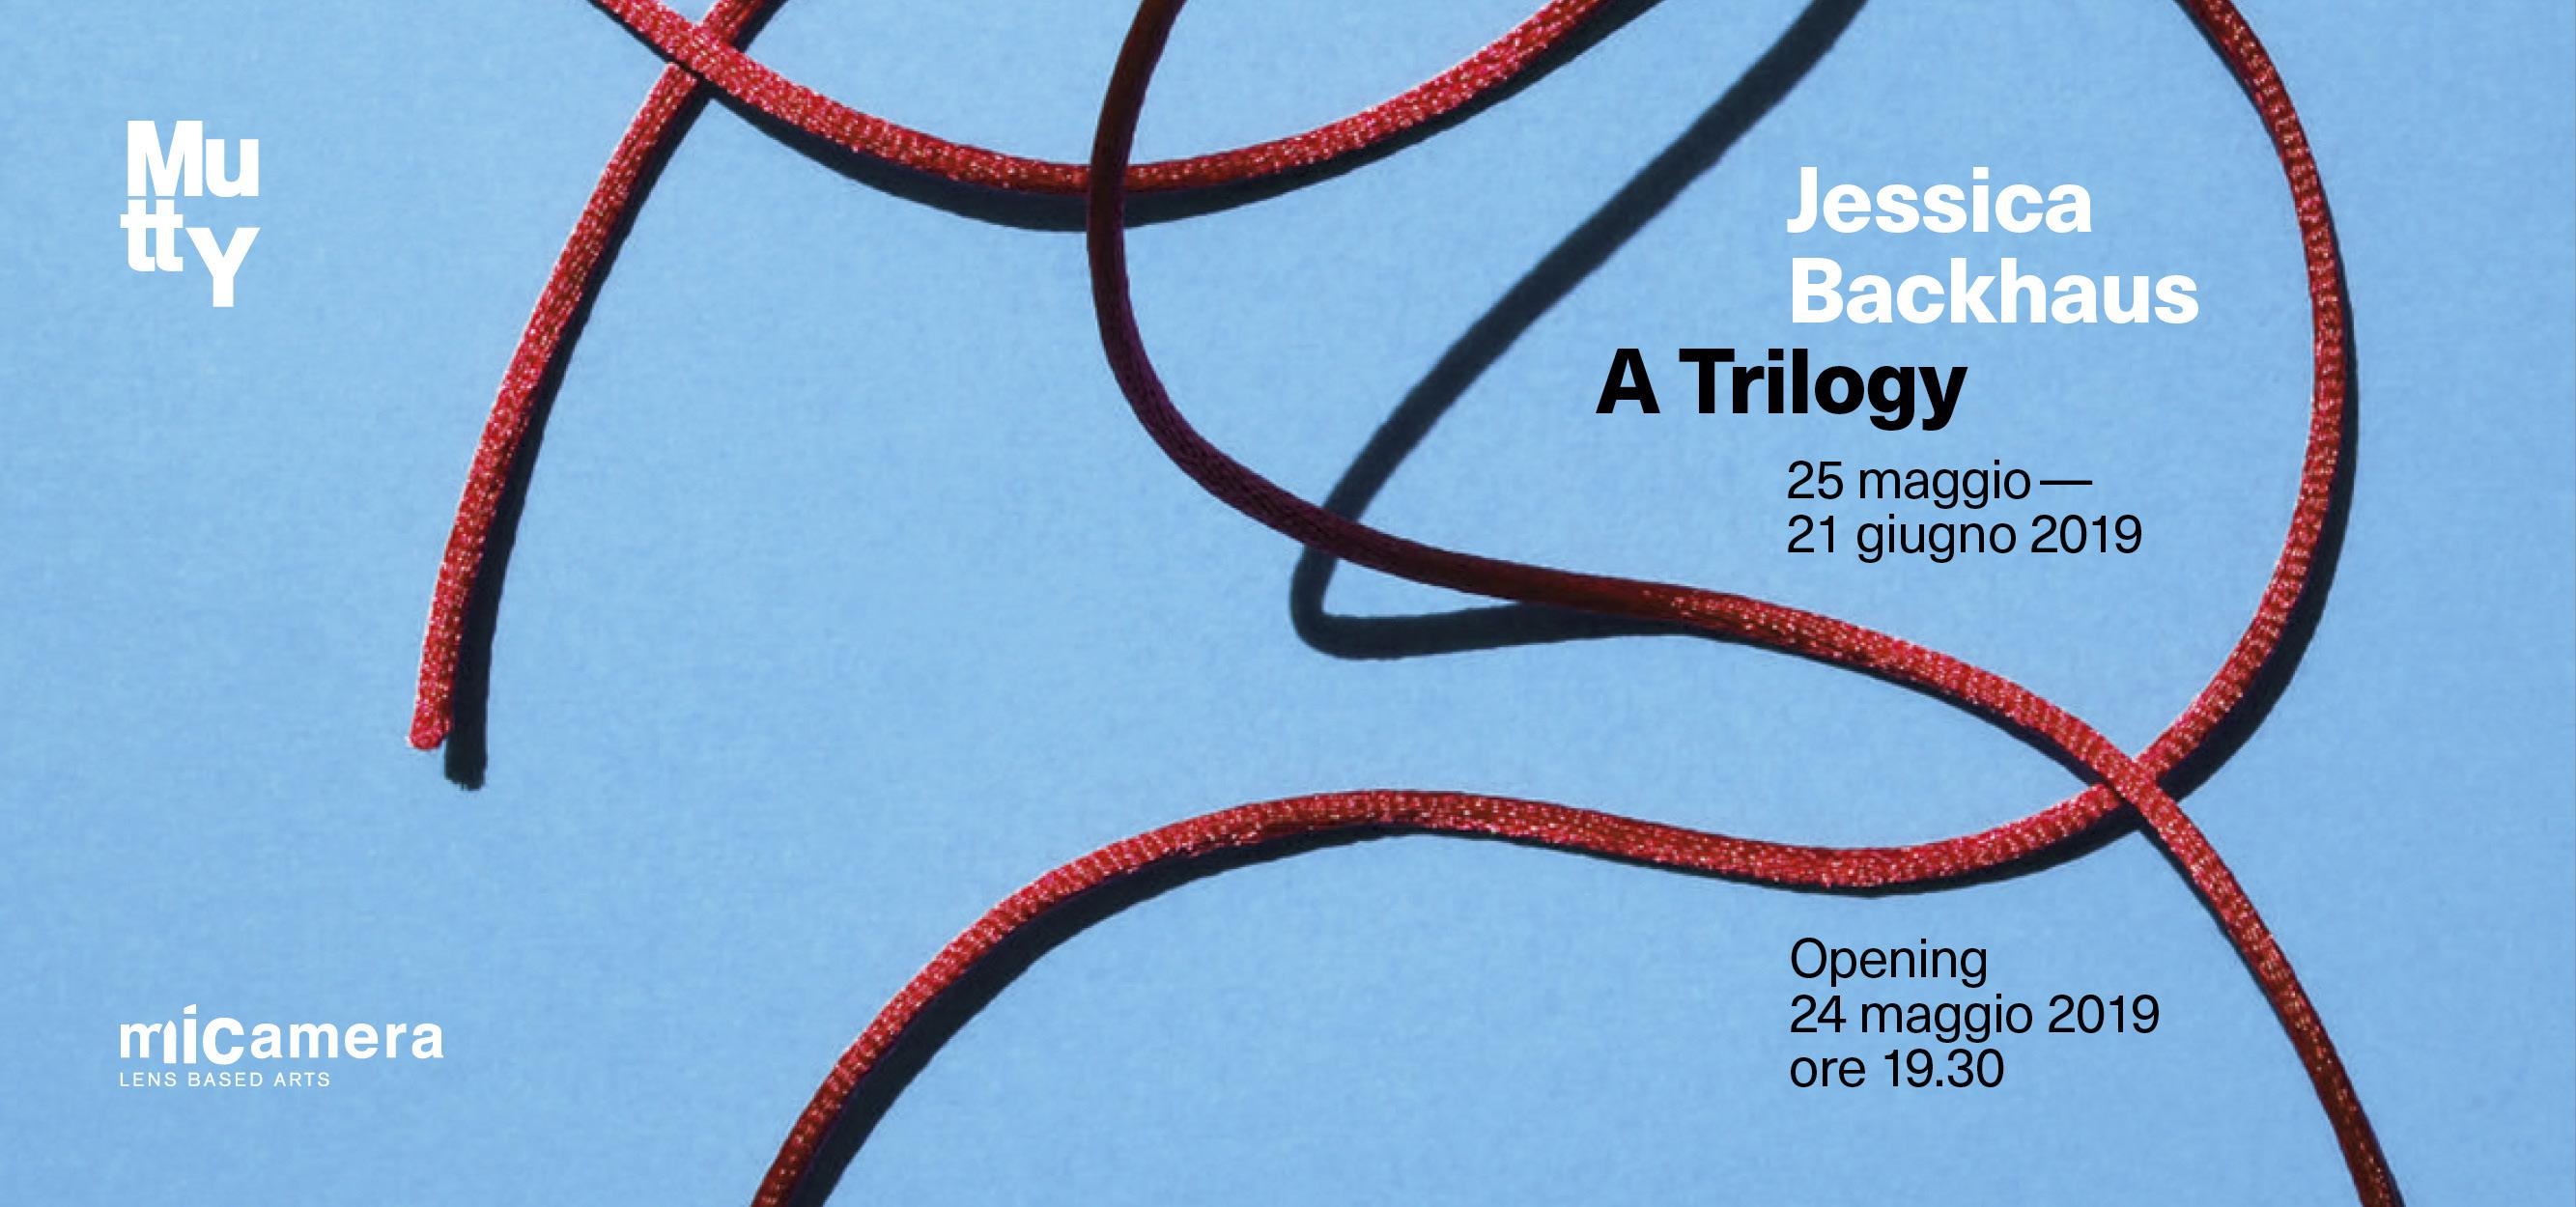 A Trilogy / Mostra di Jessica Backhaus